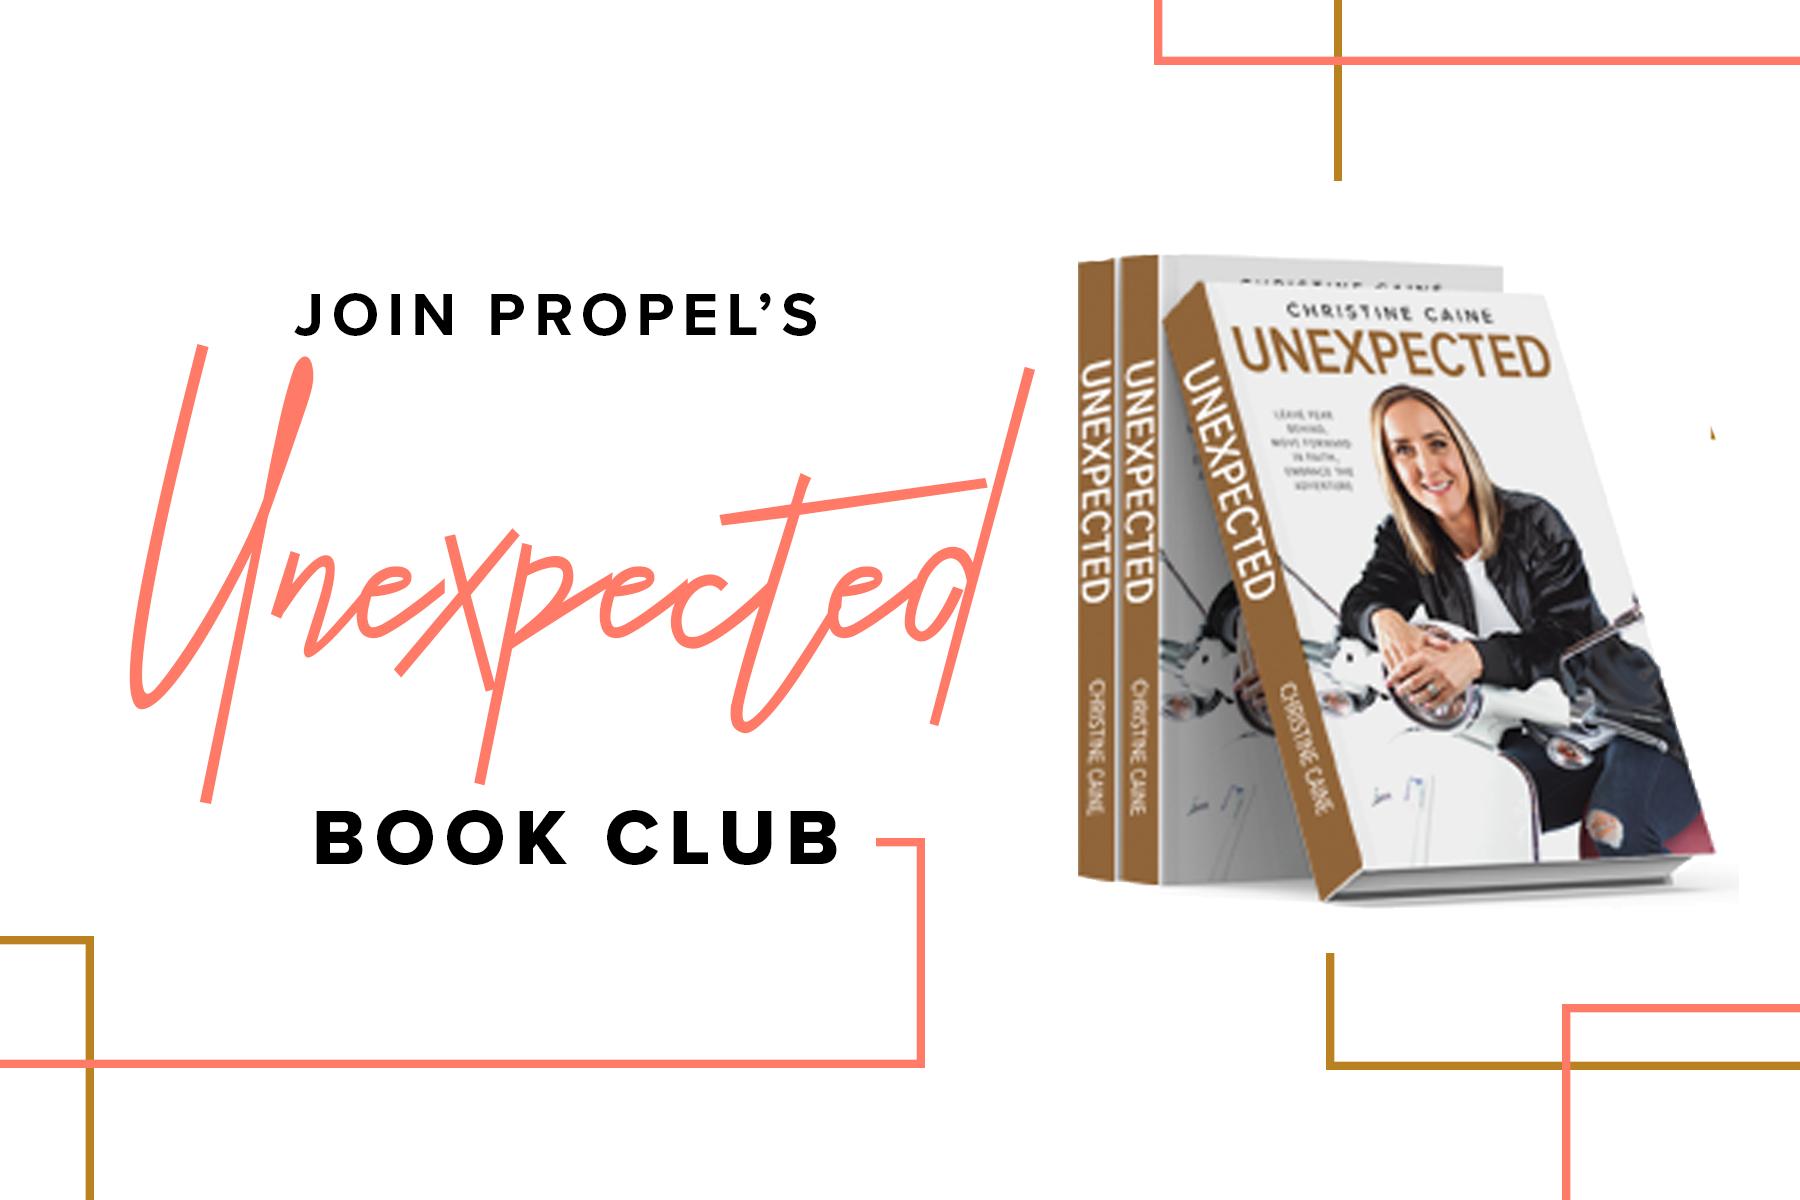 Unexpected Christine Caine Book Club